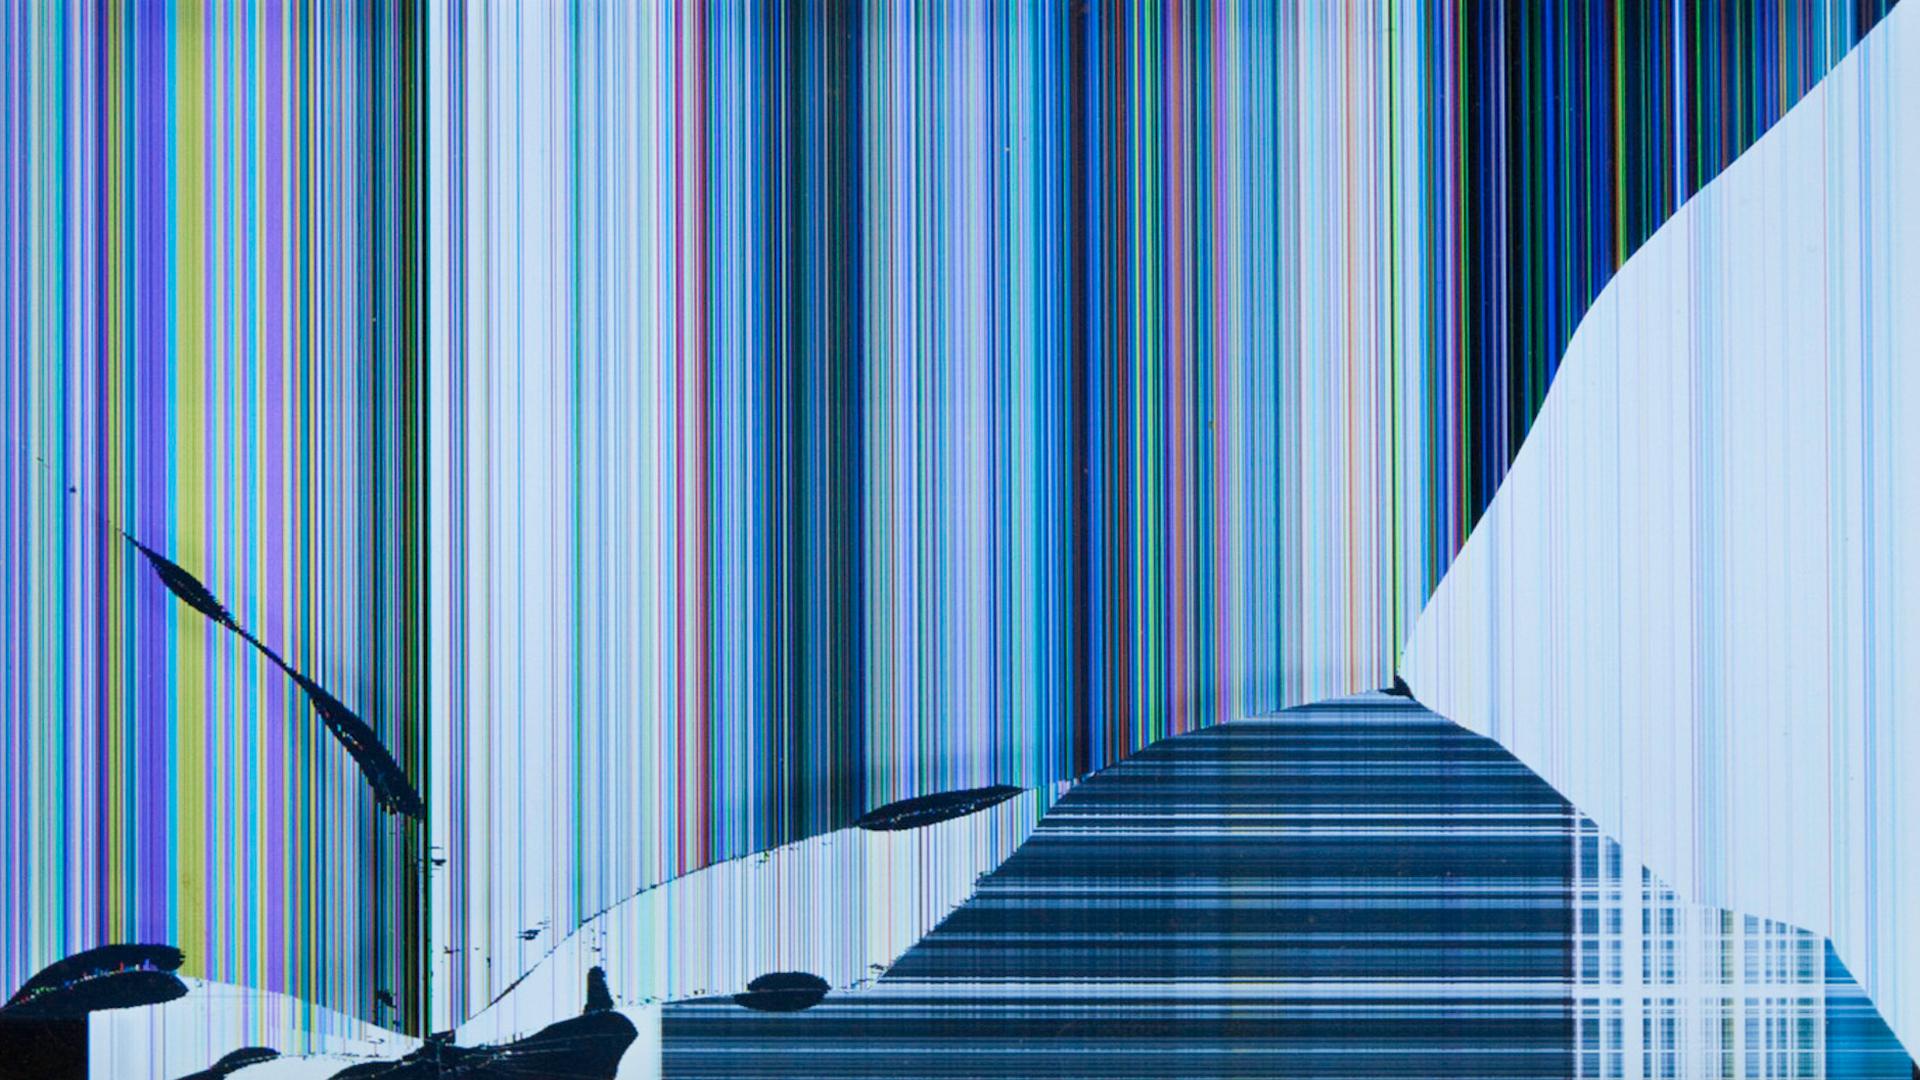 3d Broken Glass Wallpapers Fake Broken Lcd Screen For Laptop Background 15 Of 49